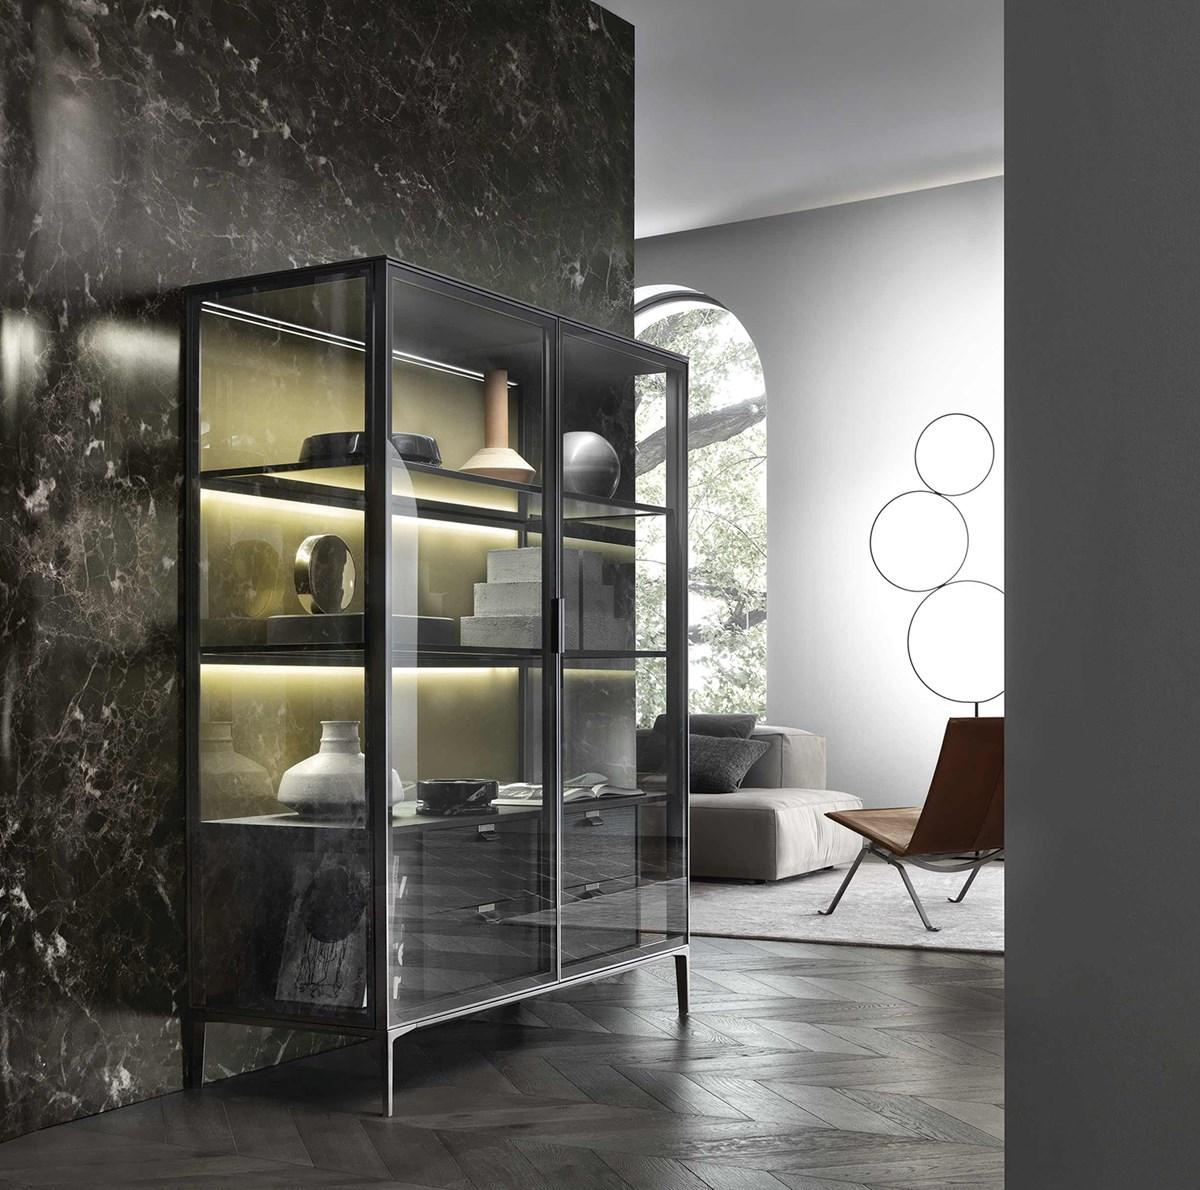 Rimadesio-Giuseppe-Bavuso-Alambra-Storage-Matisse-1